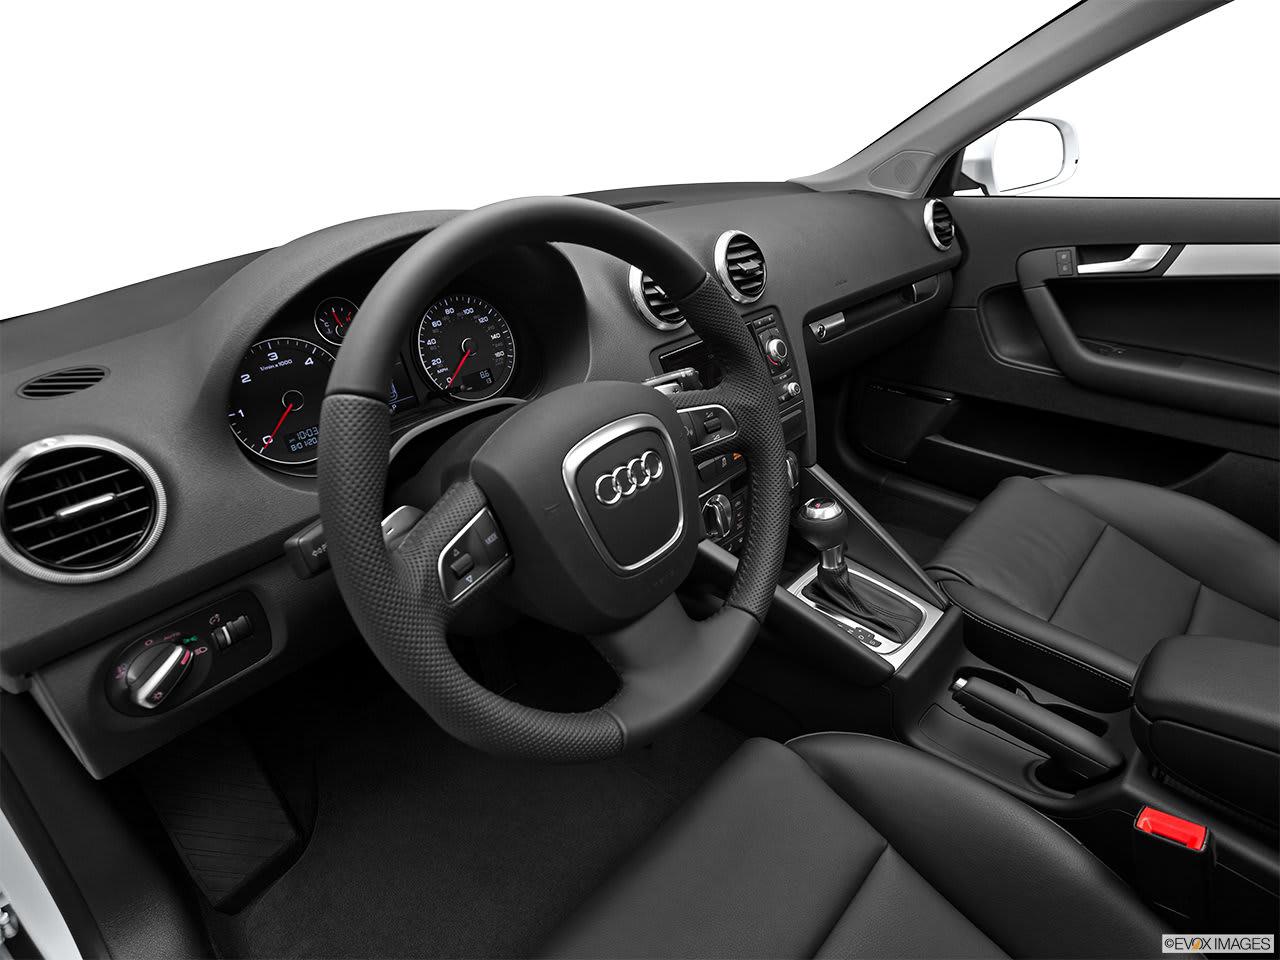 Audi A3 TDI 2012 Interior